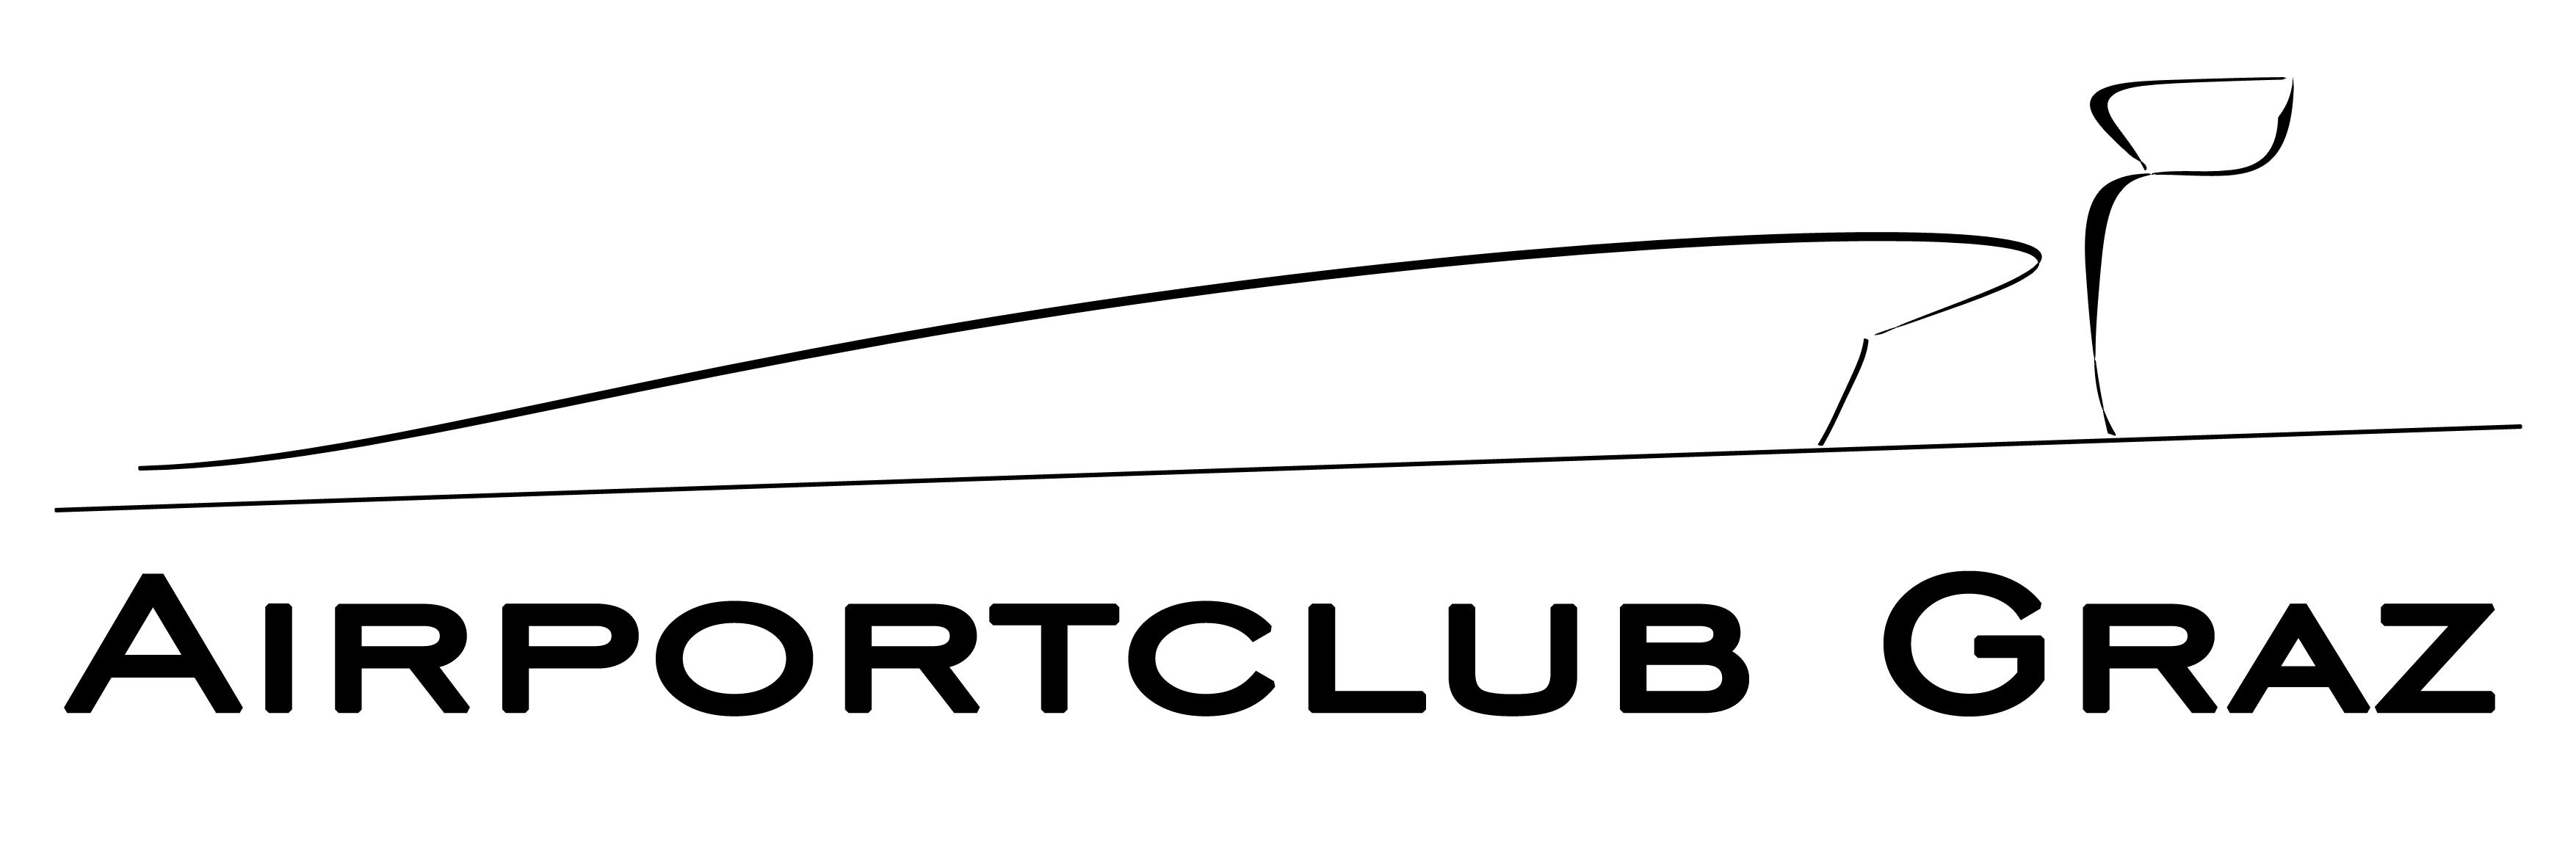 Airportclub Graz